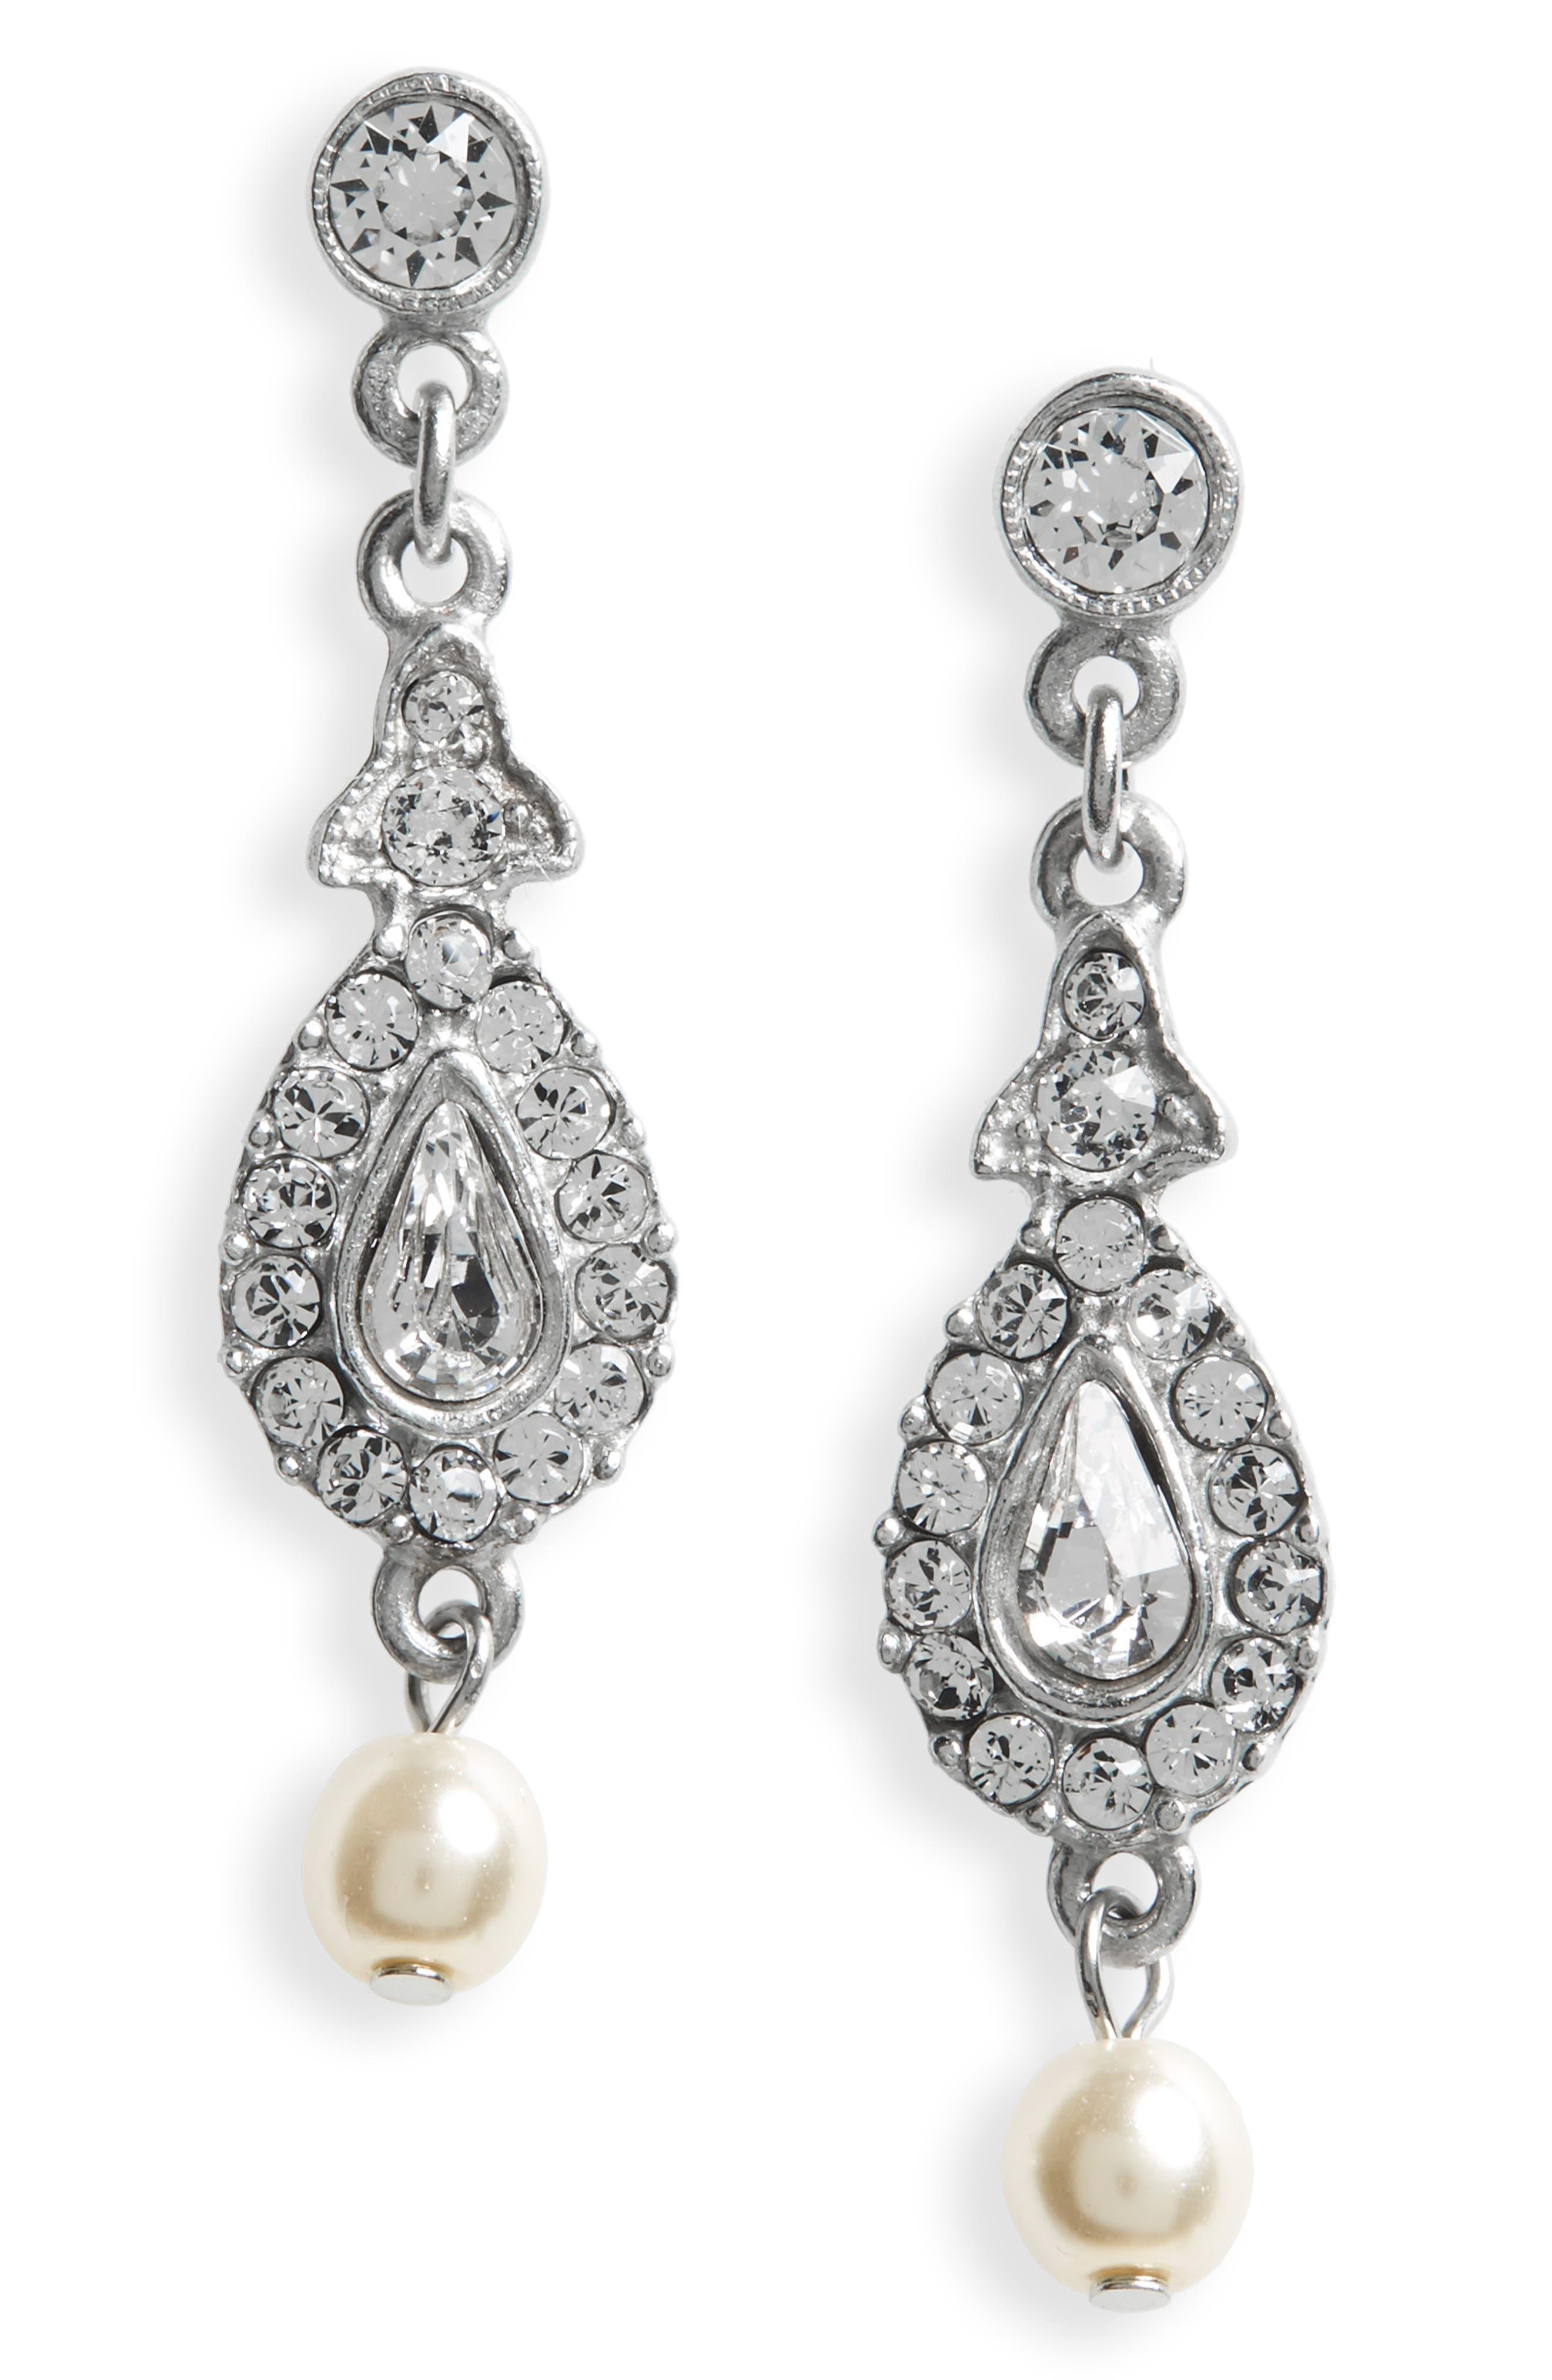 Glass Pearl & Swarovski Crystal Drop Earrings,                             Main thumbnail 1, color,                             SILVER / IVORY